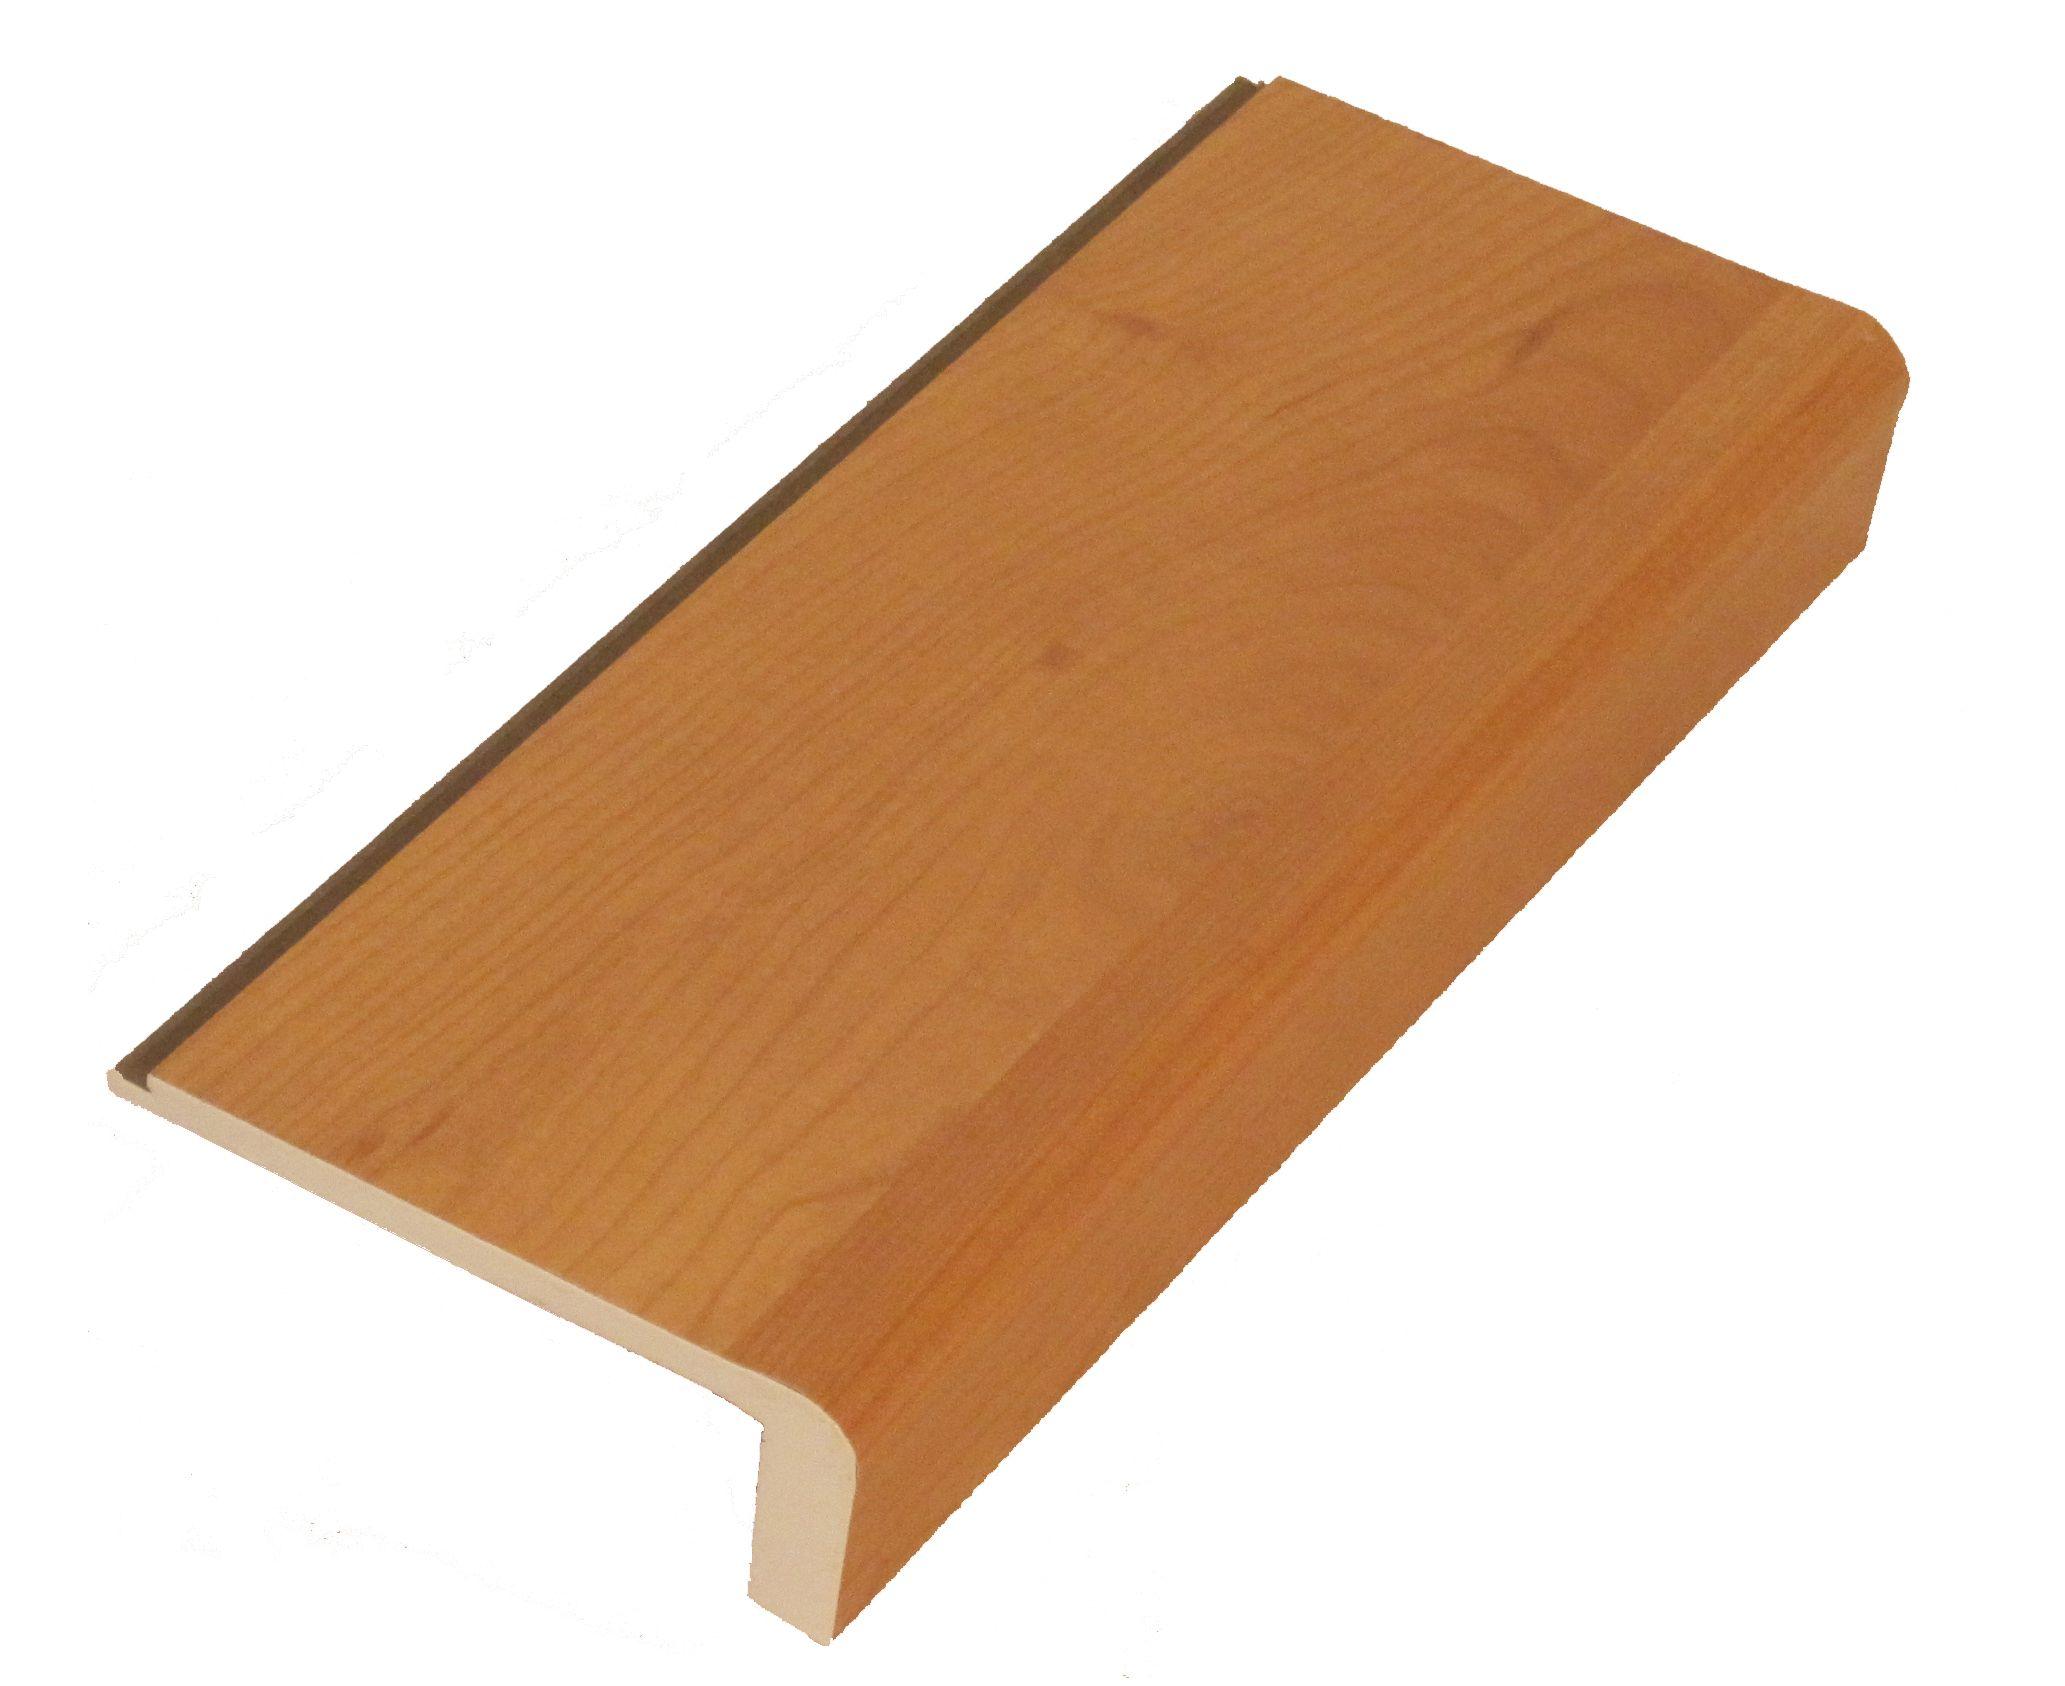 Mamperl n laminado para escaleras canto curvo http - Canto para madera ...